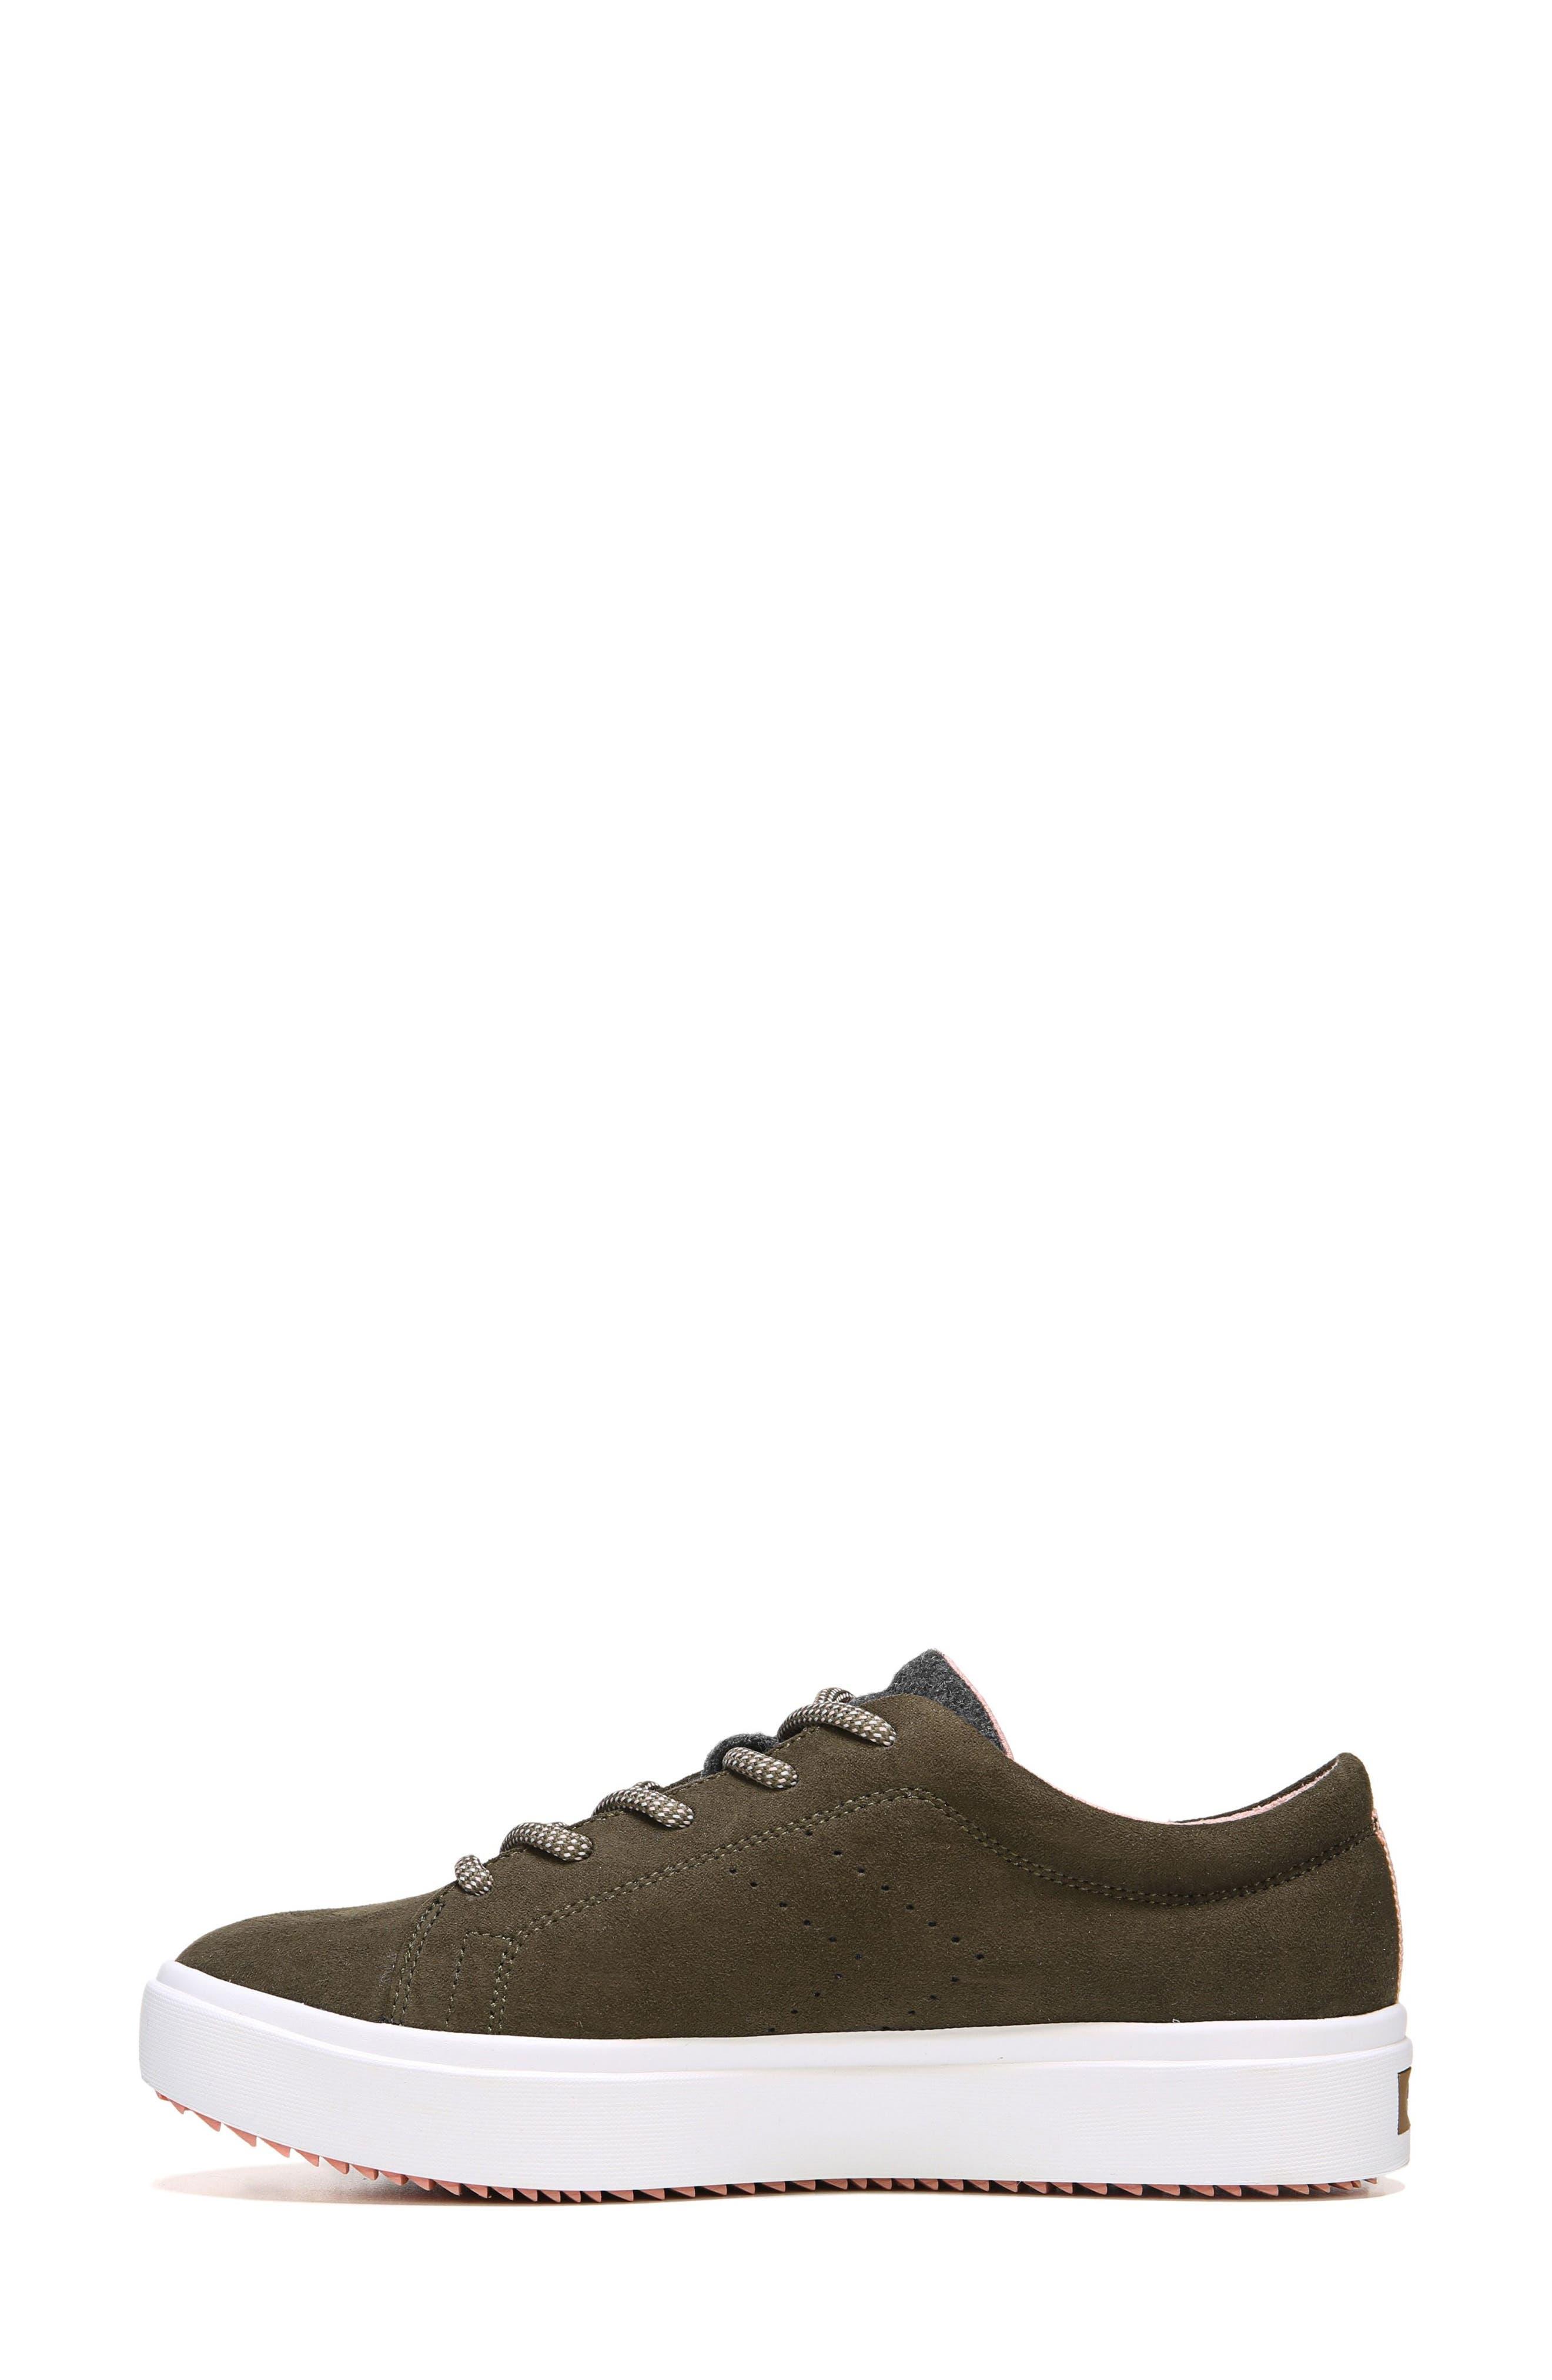 Wander Sneaker,                             Alternate thumbnail 2, color,                             020